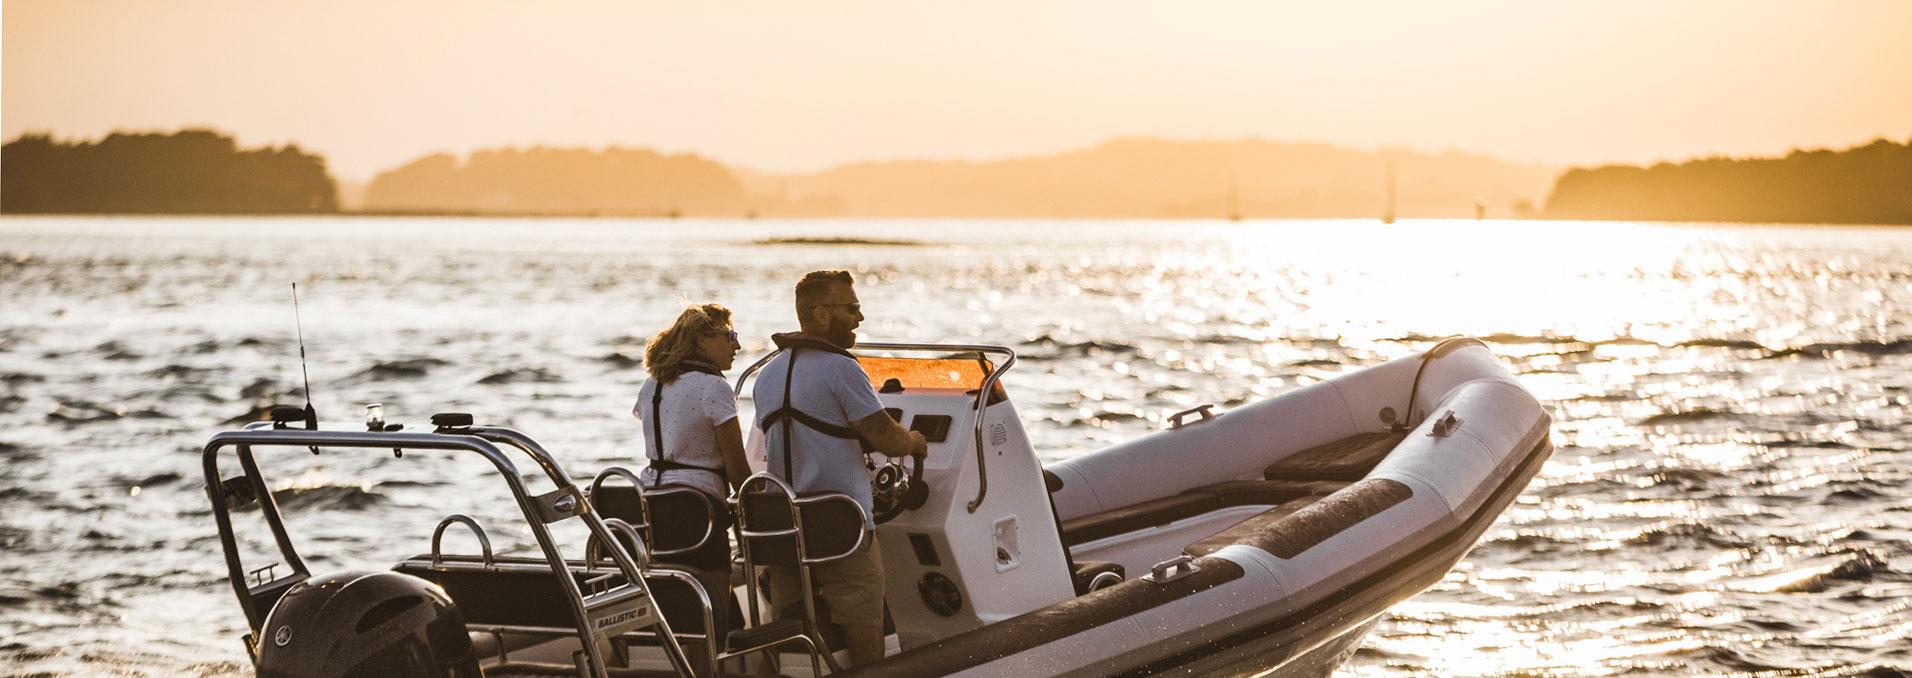 Boat Club Trafalgar - boat share membership